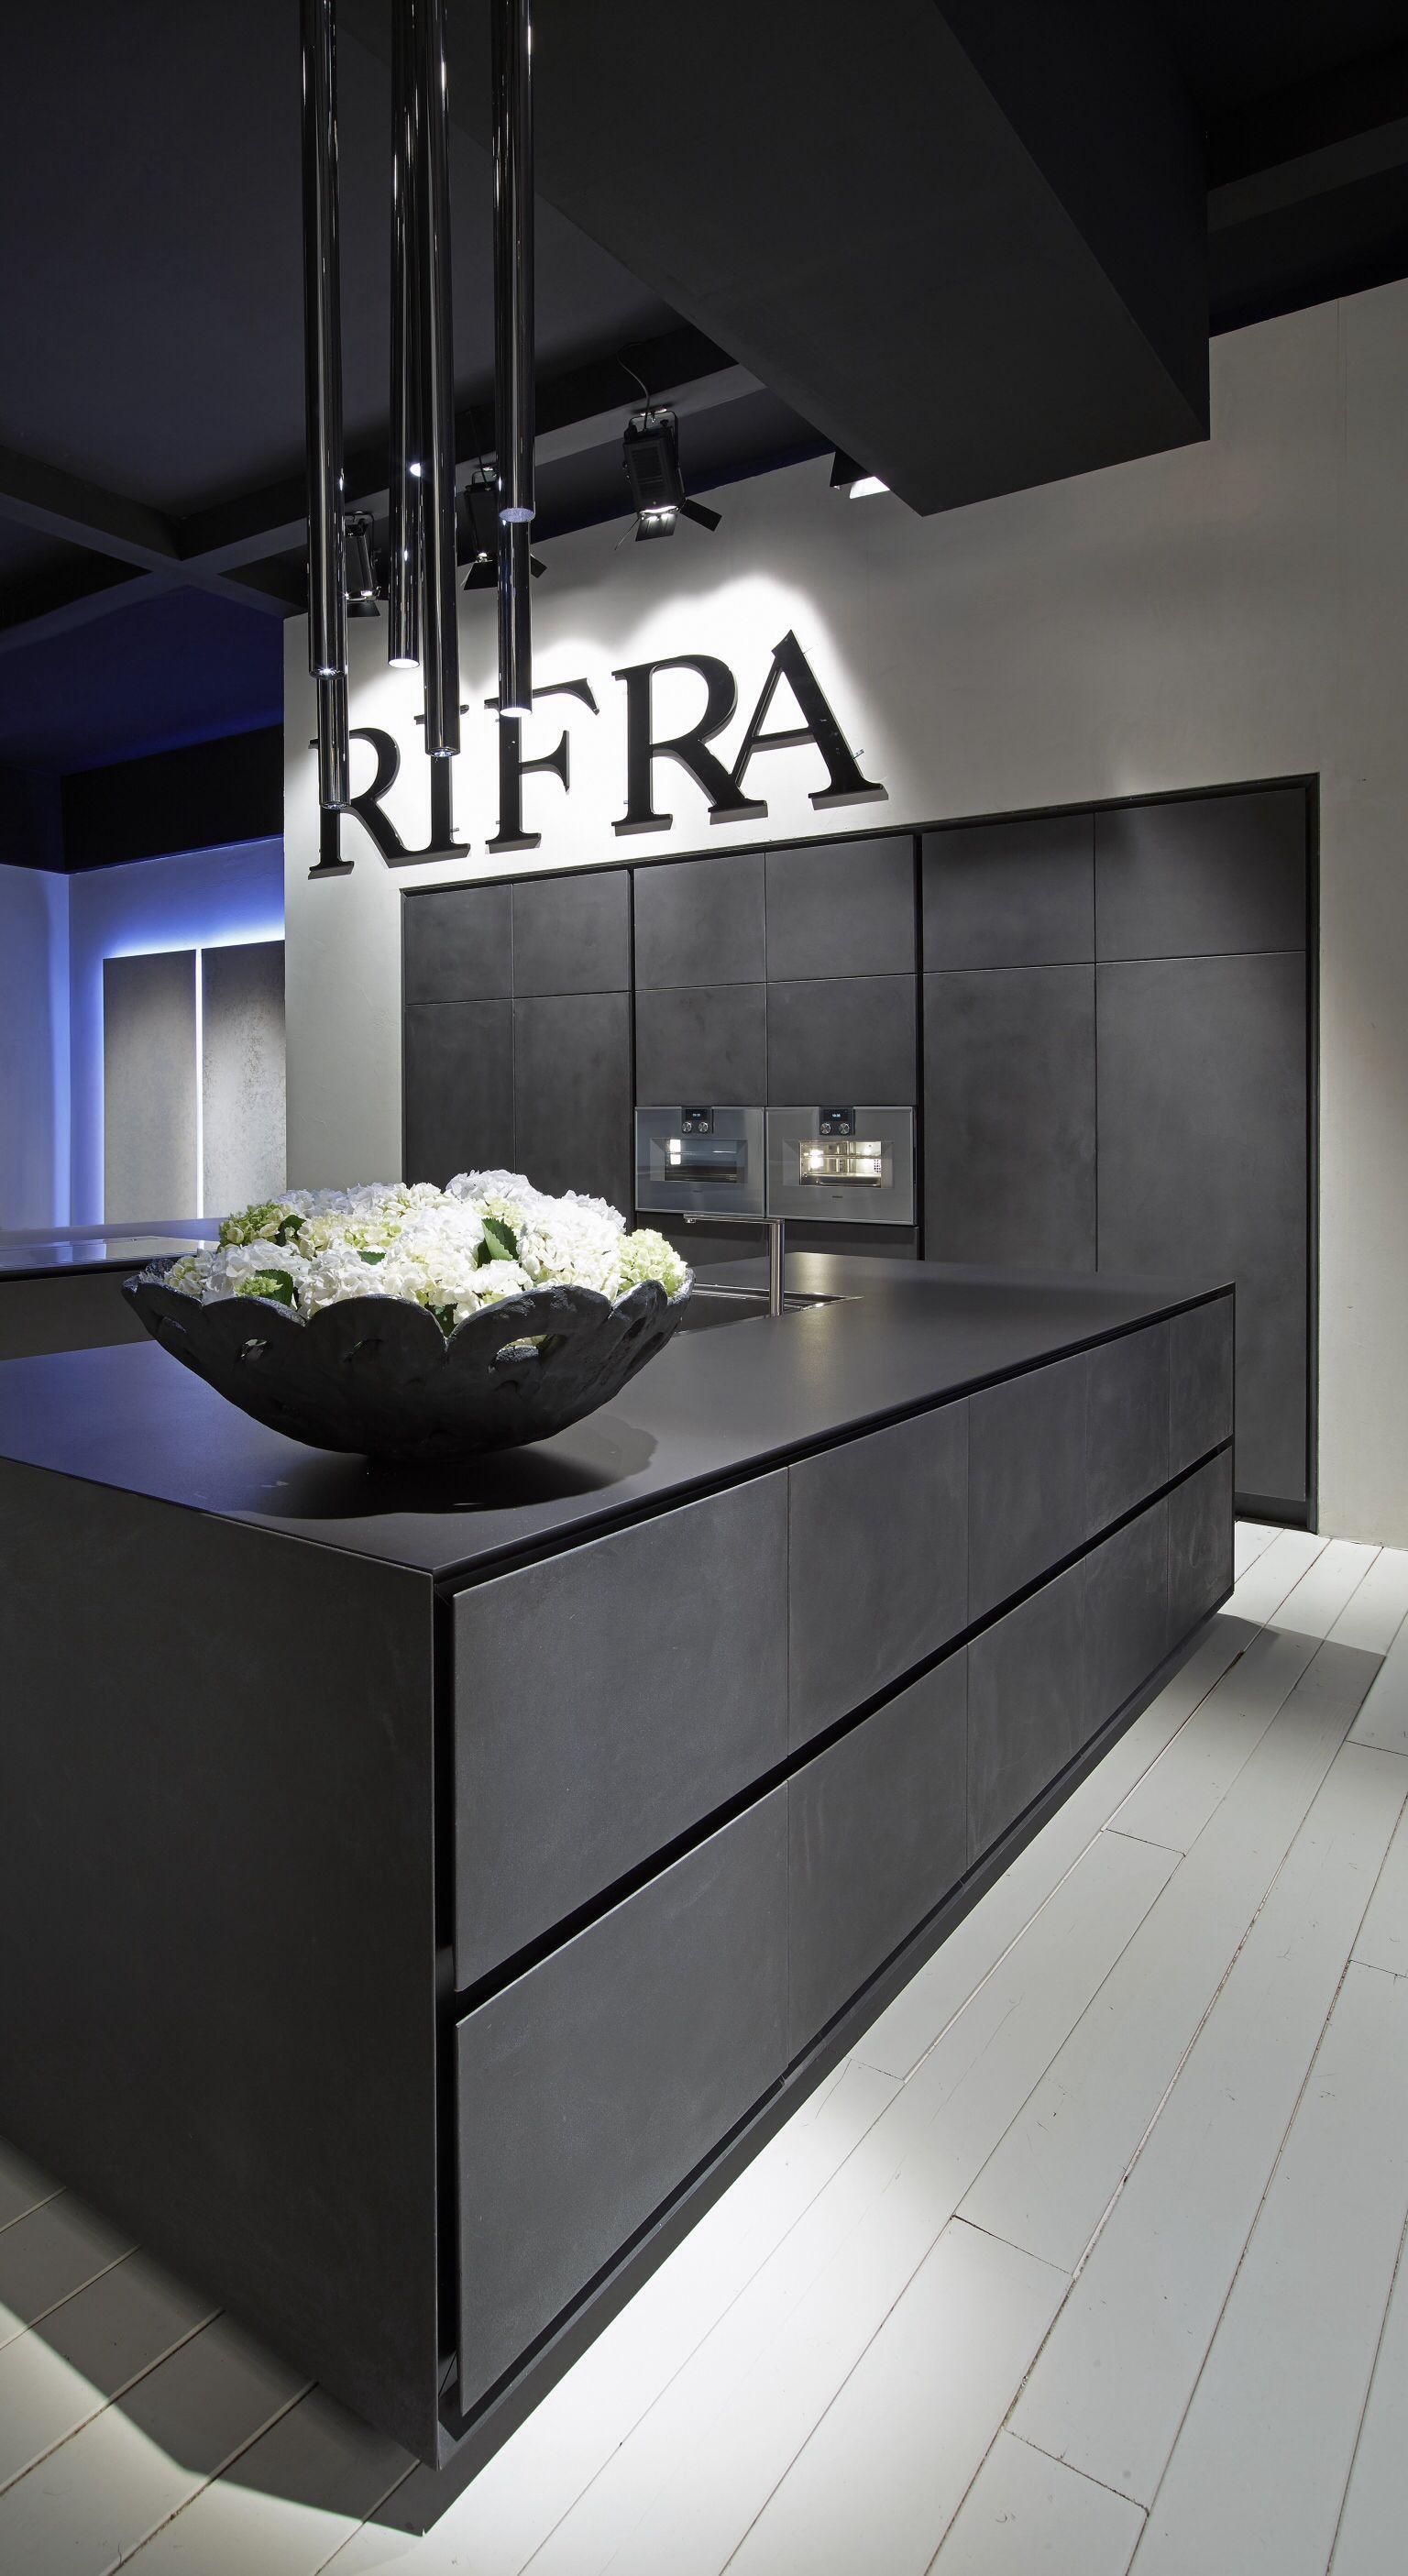 Rifra Cucina Milano 2014 One | Rifra Cucine Milano 2014 in 2019 ...